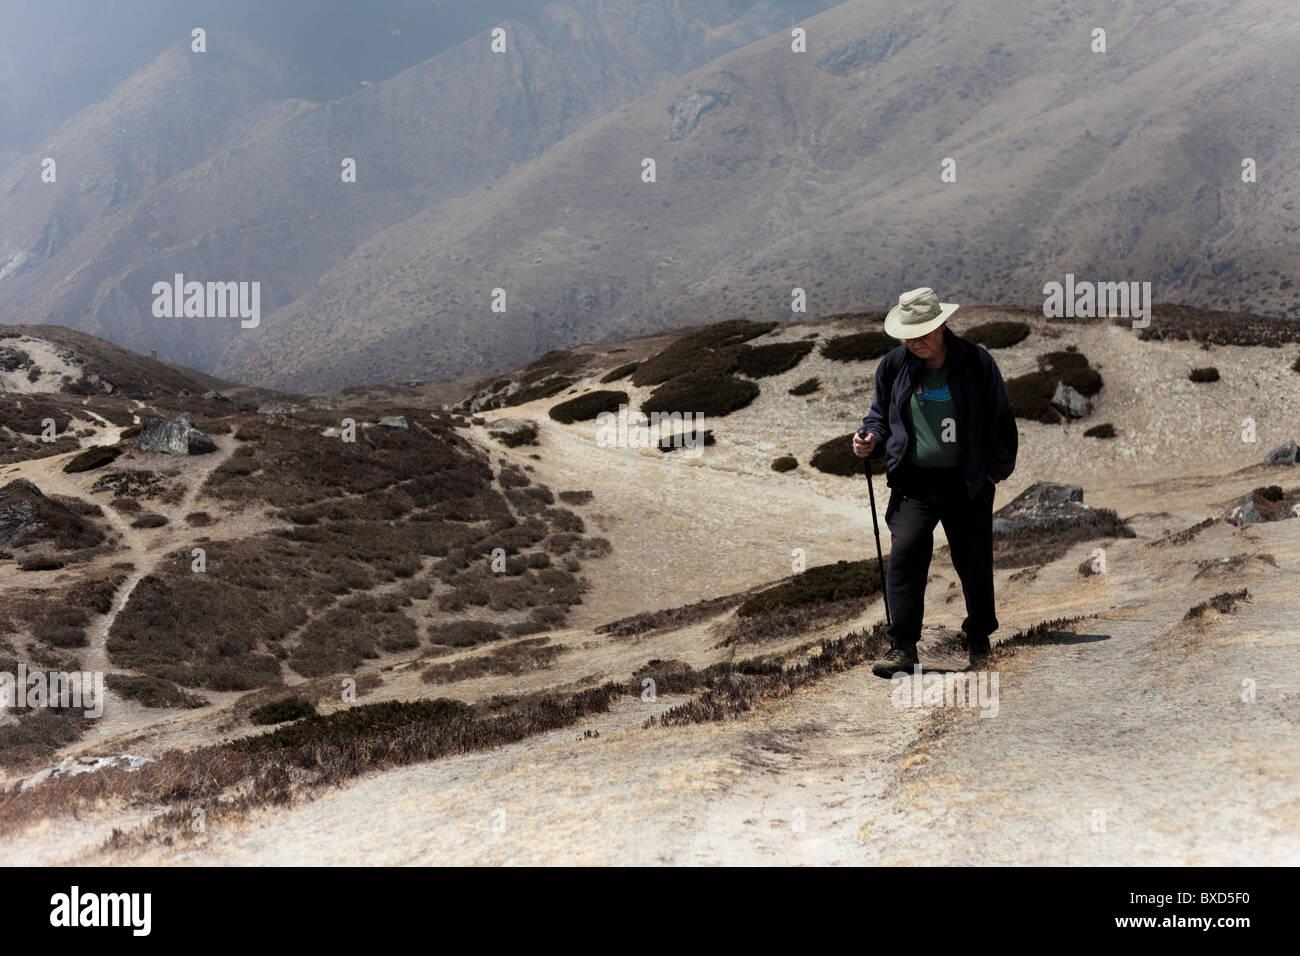 An unladen, male trekker walks to Amadablam base camp. - Stock Image